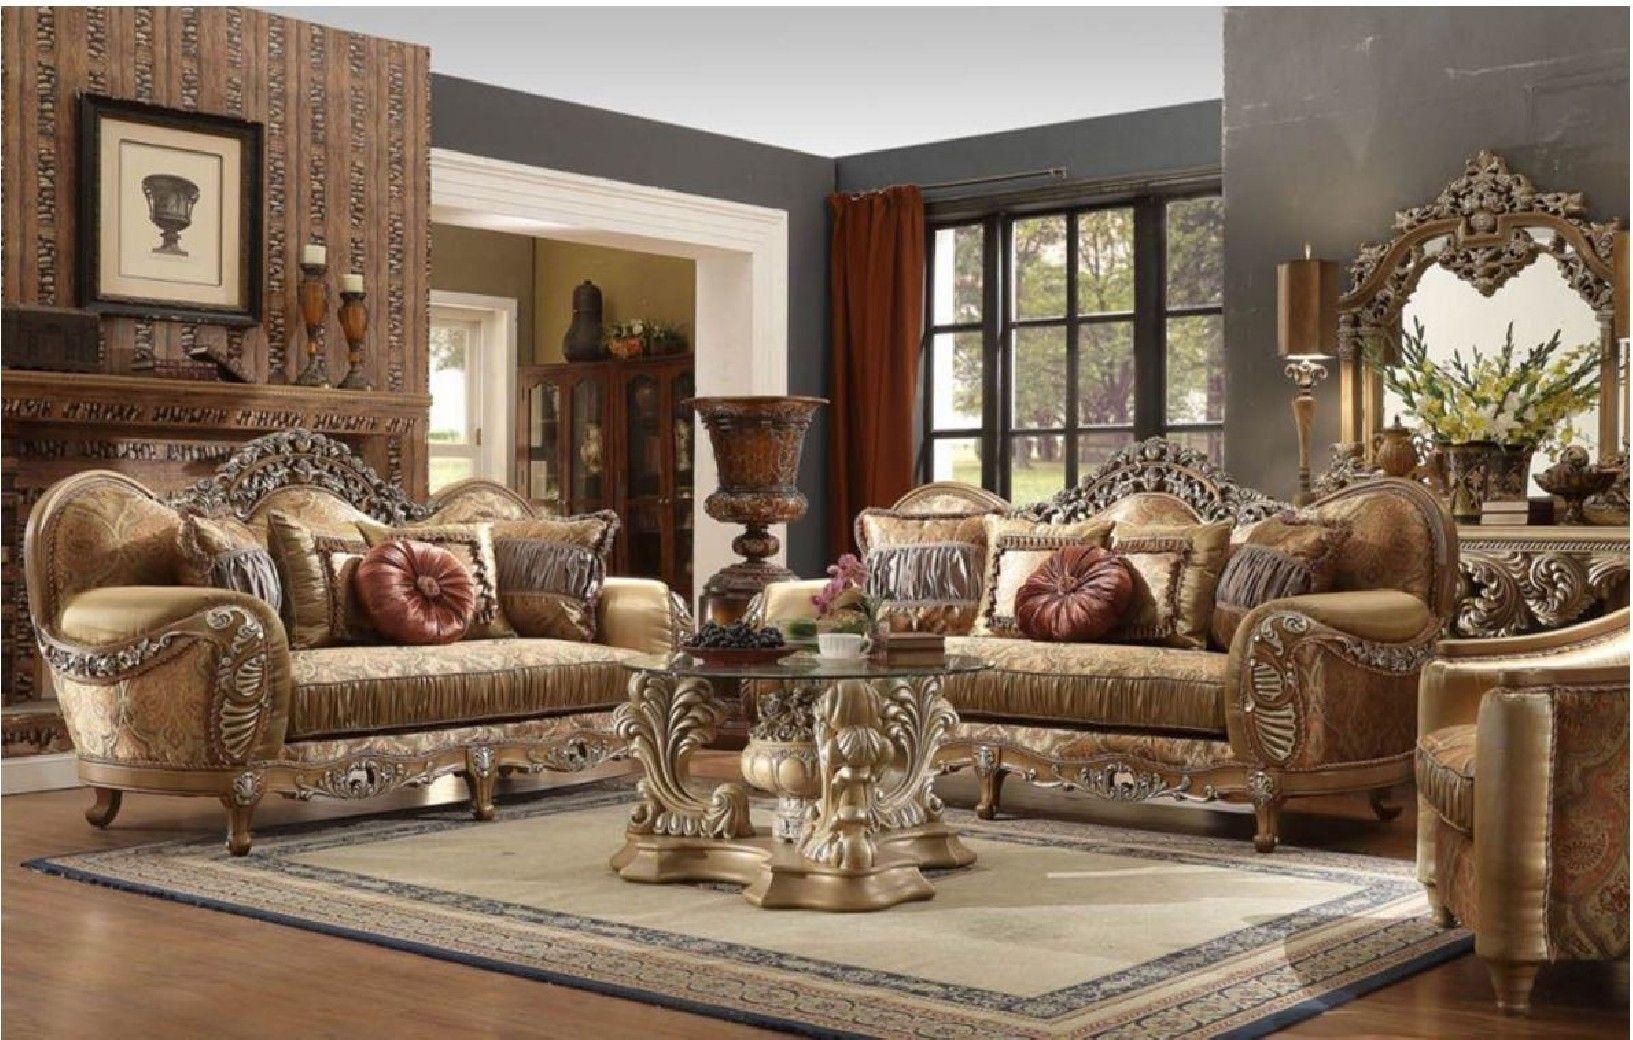 Hd 622 Homey Design Upholstery Living Room Set Victorian Euro